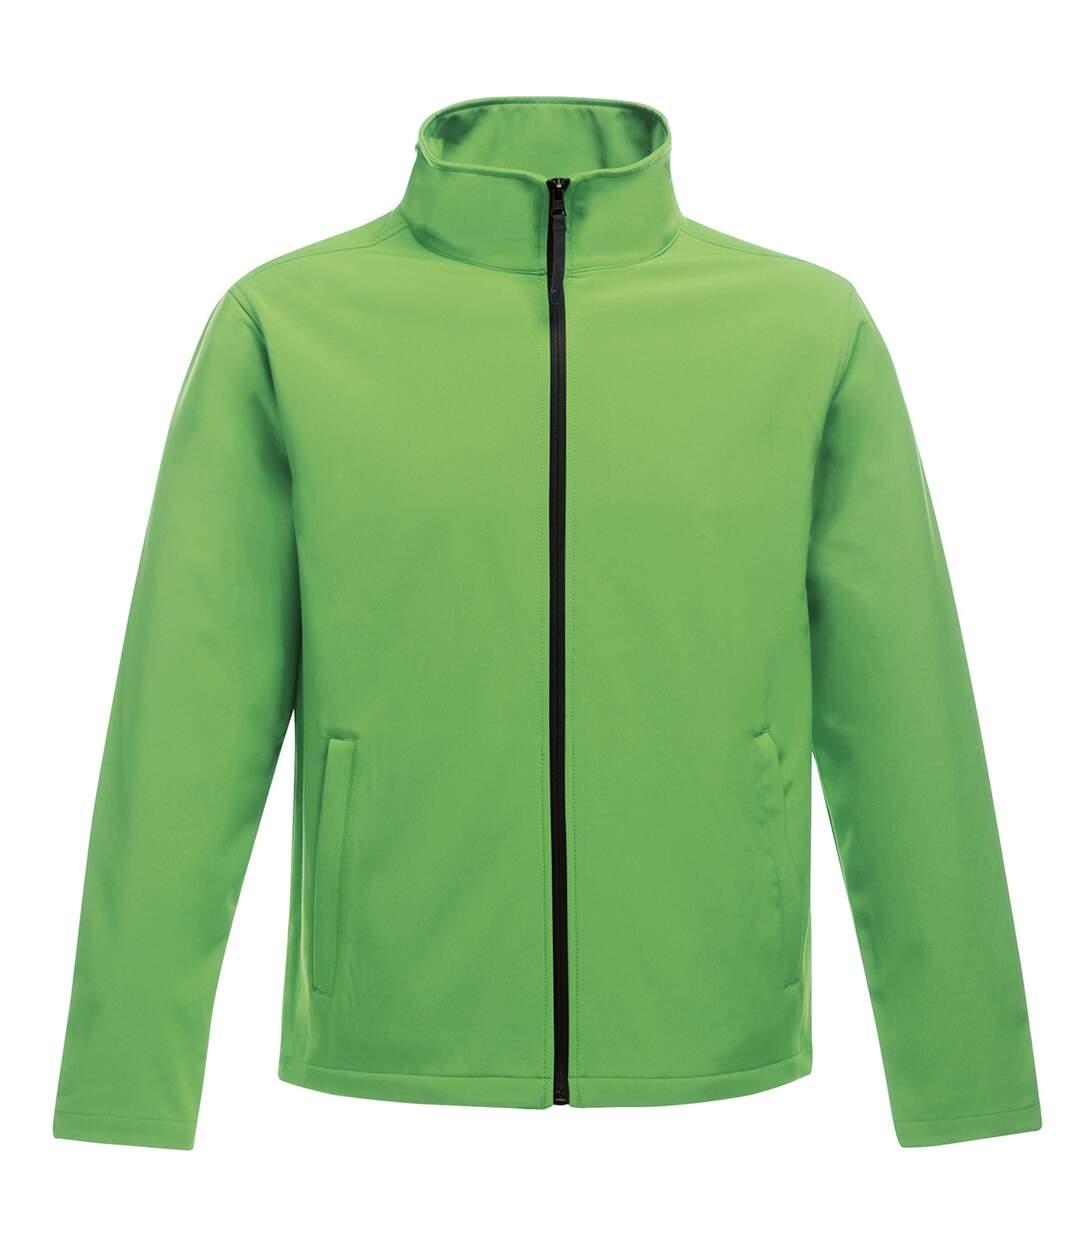 Regatta Standout Mens Ablaze Printable Softshell Jacket (Extreme Green/Black) - UTRW6353